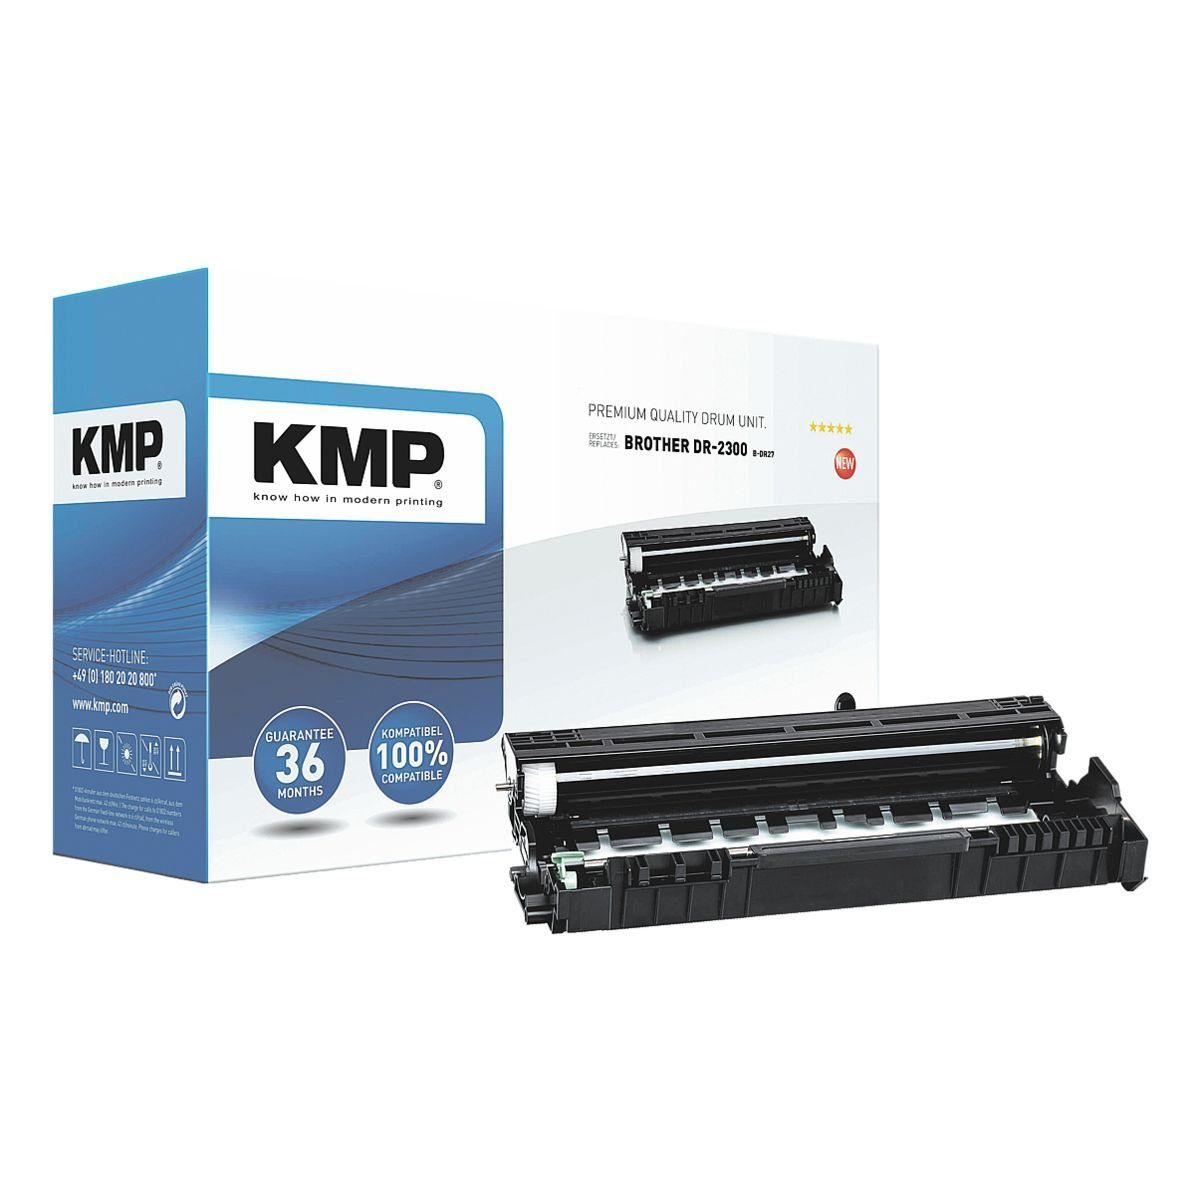 KMP Trommel (ohne Toner) ersetzt Brother »DR-2300«